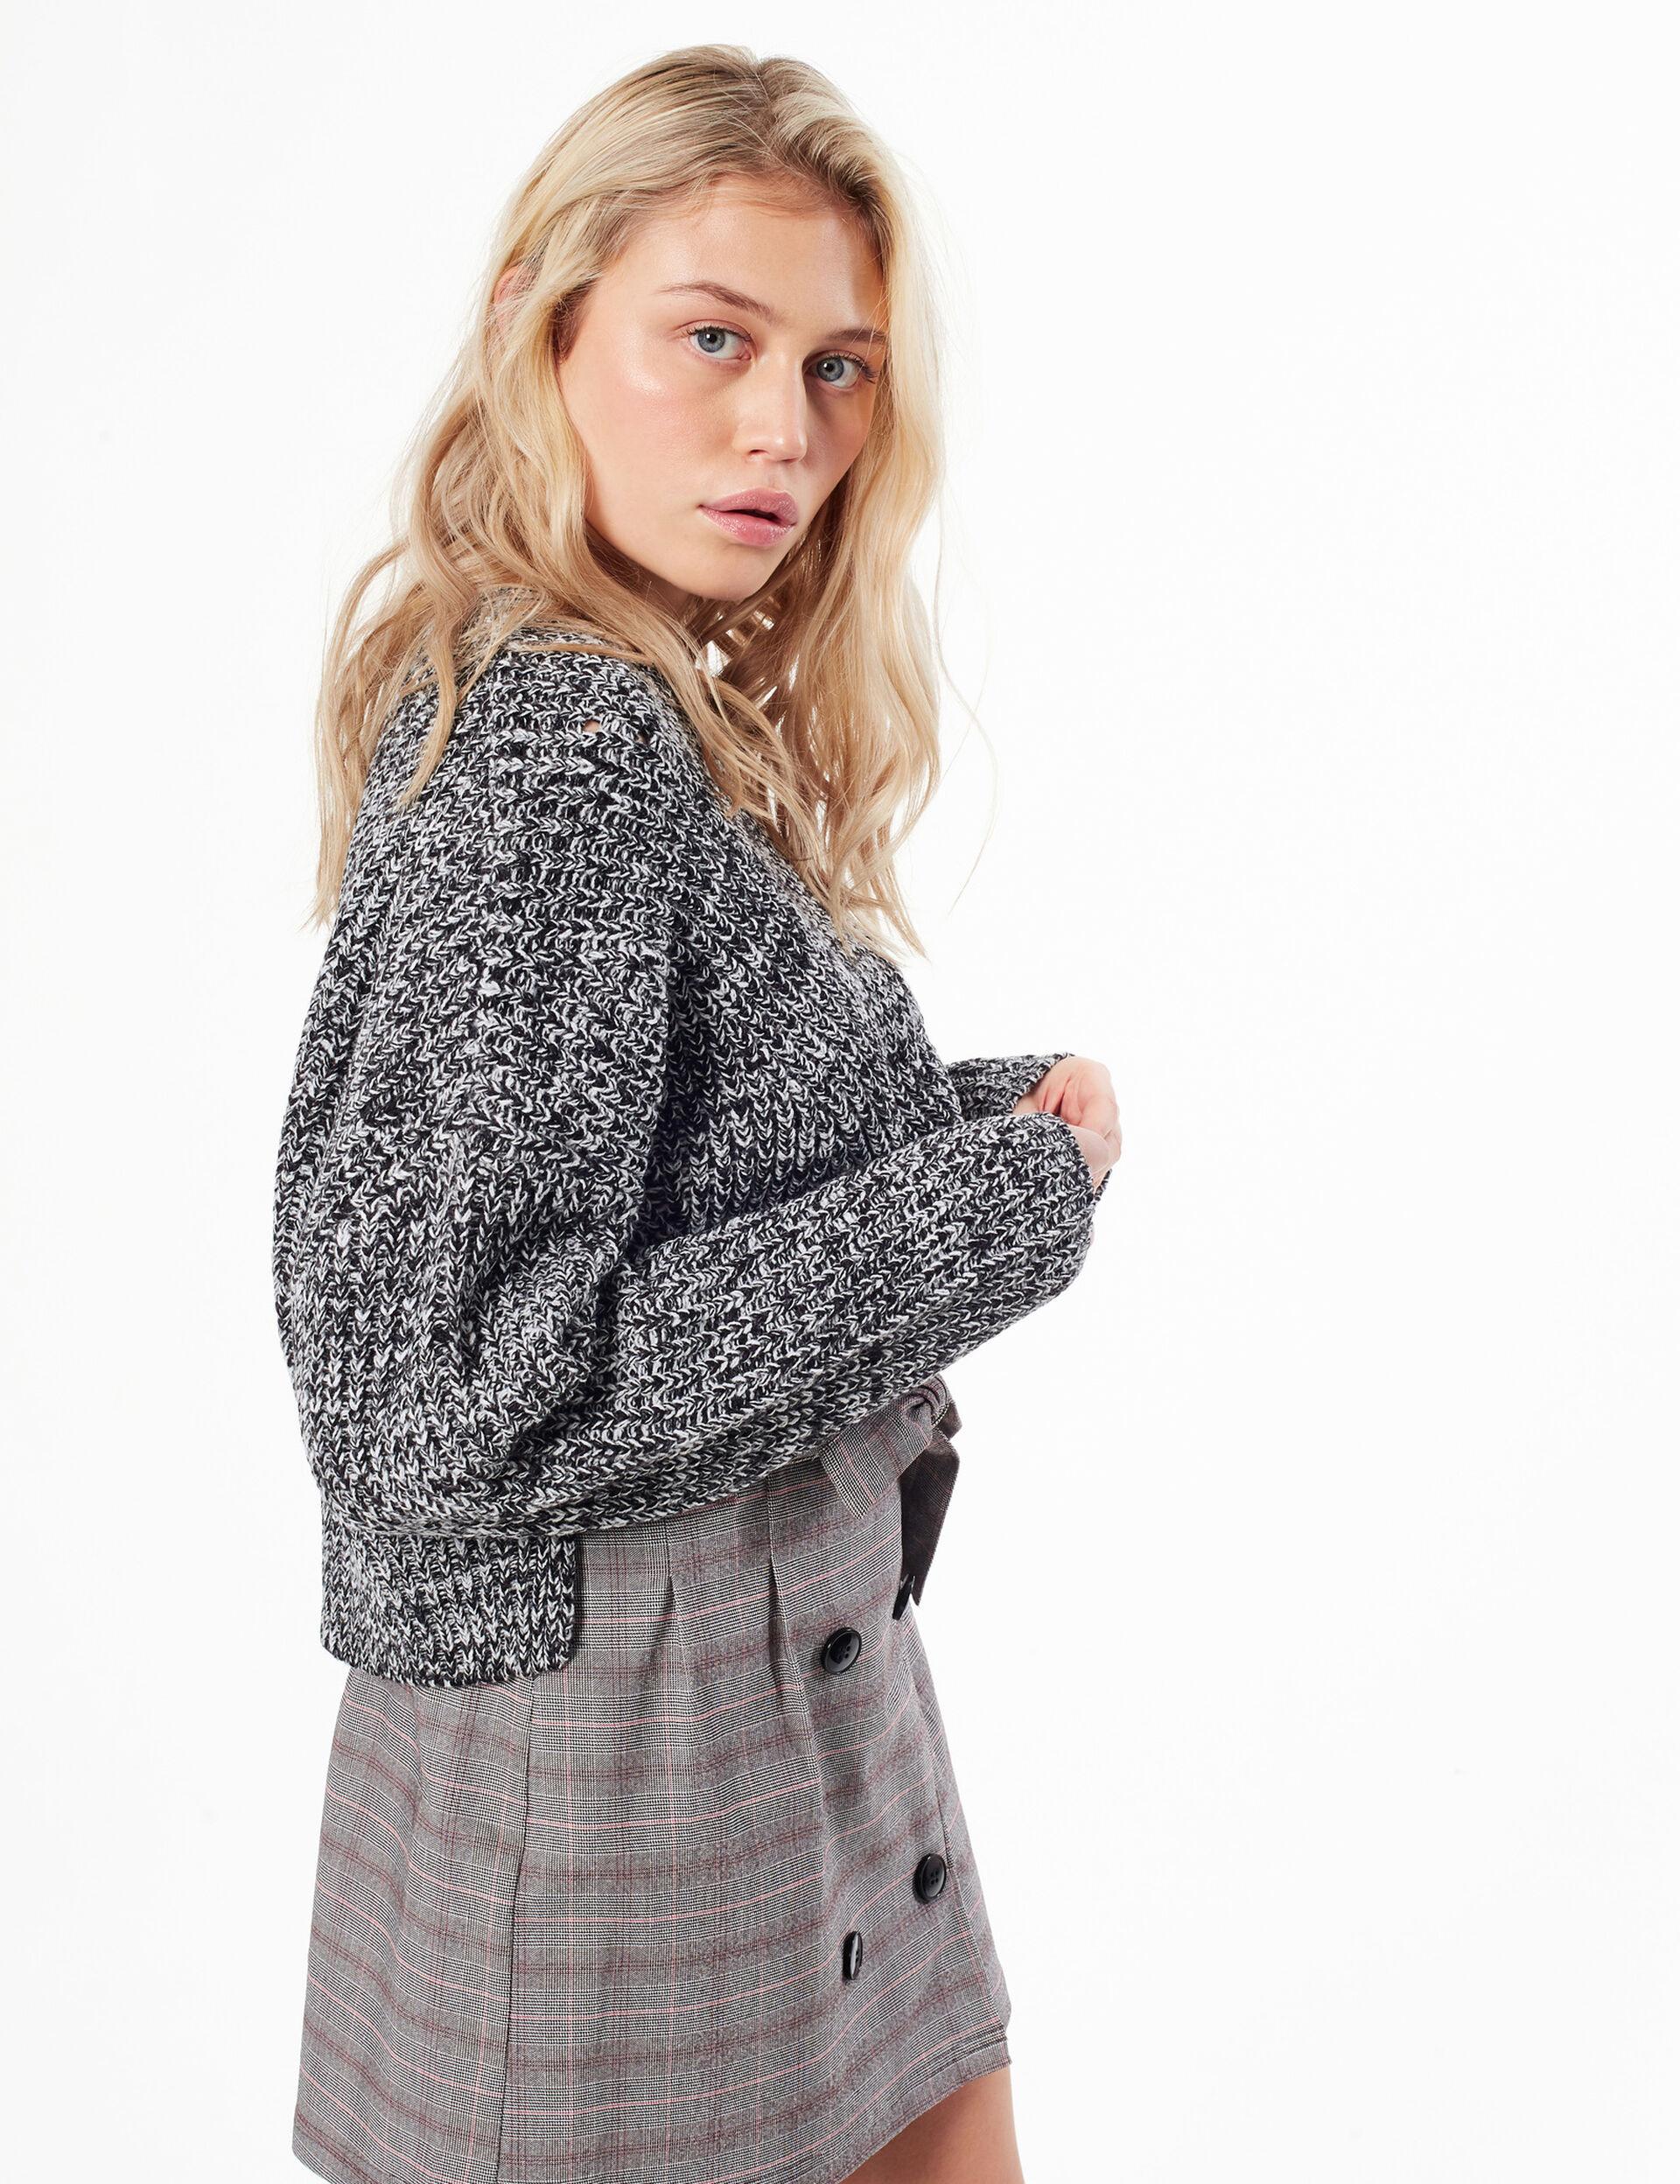 Cropped openwork braided knit jumper